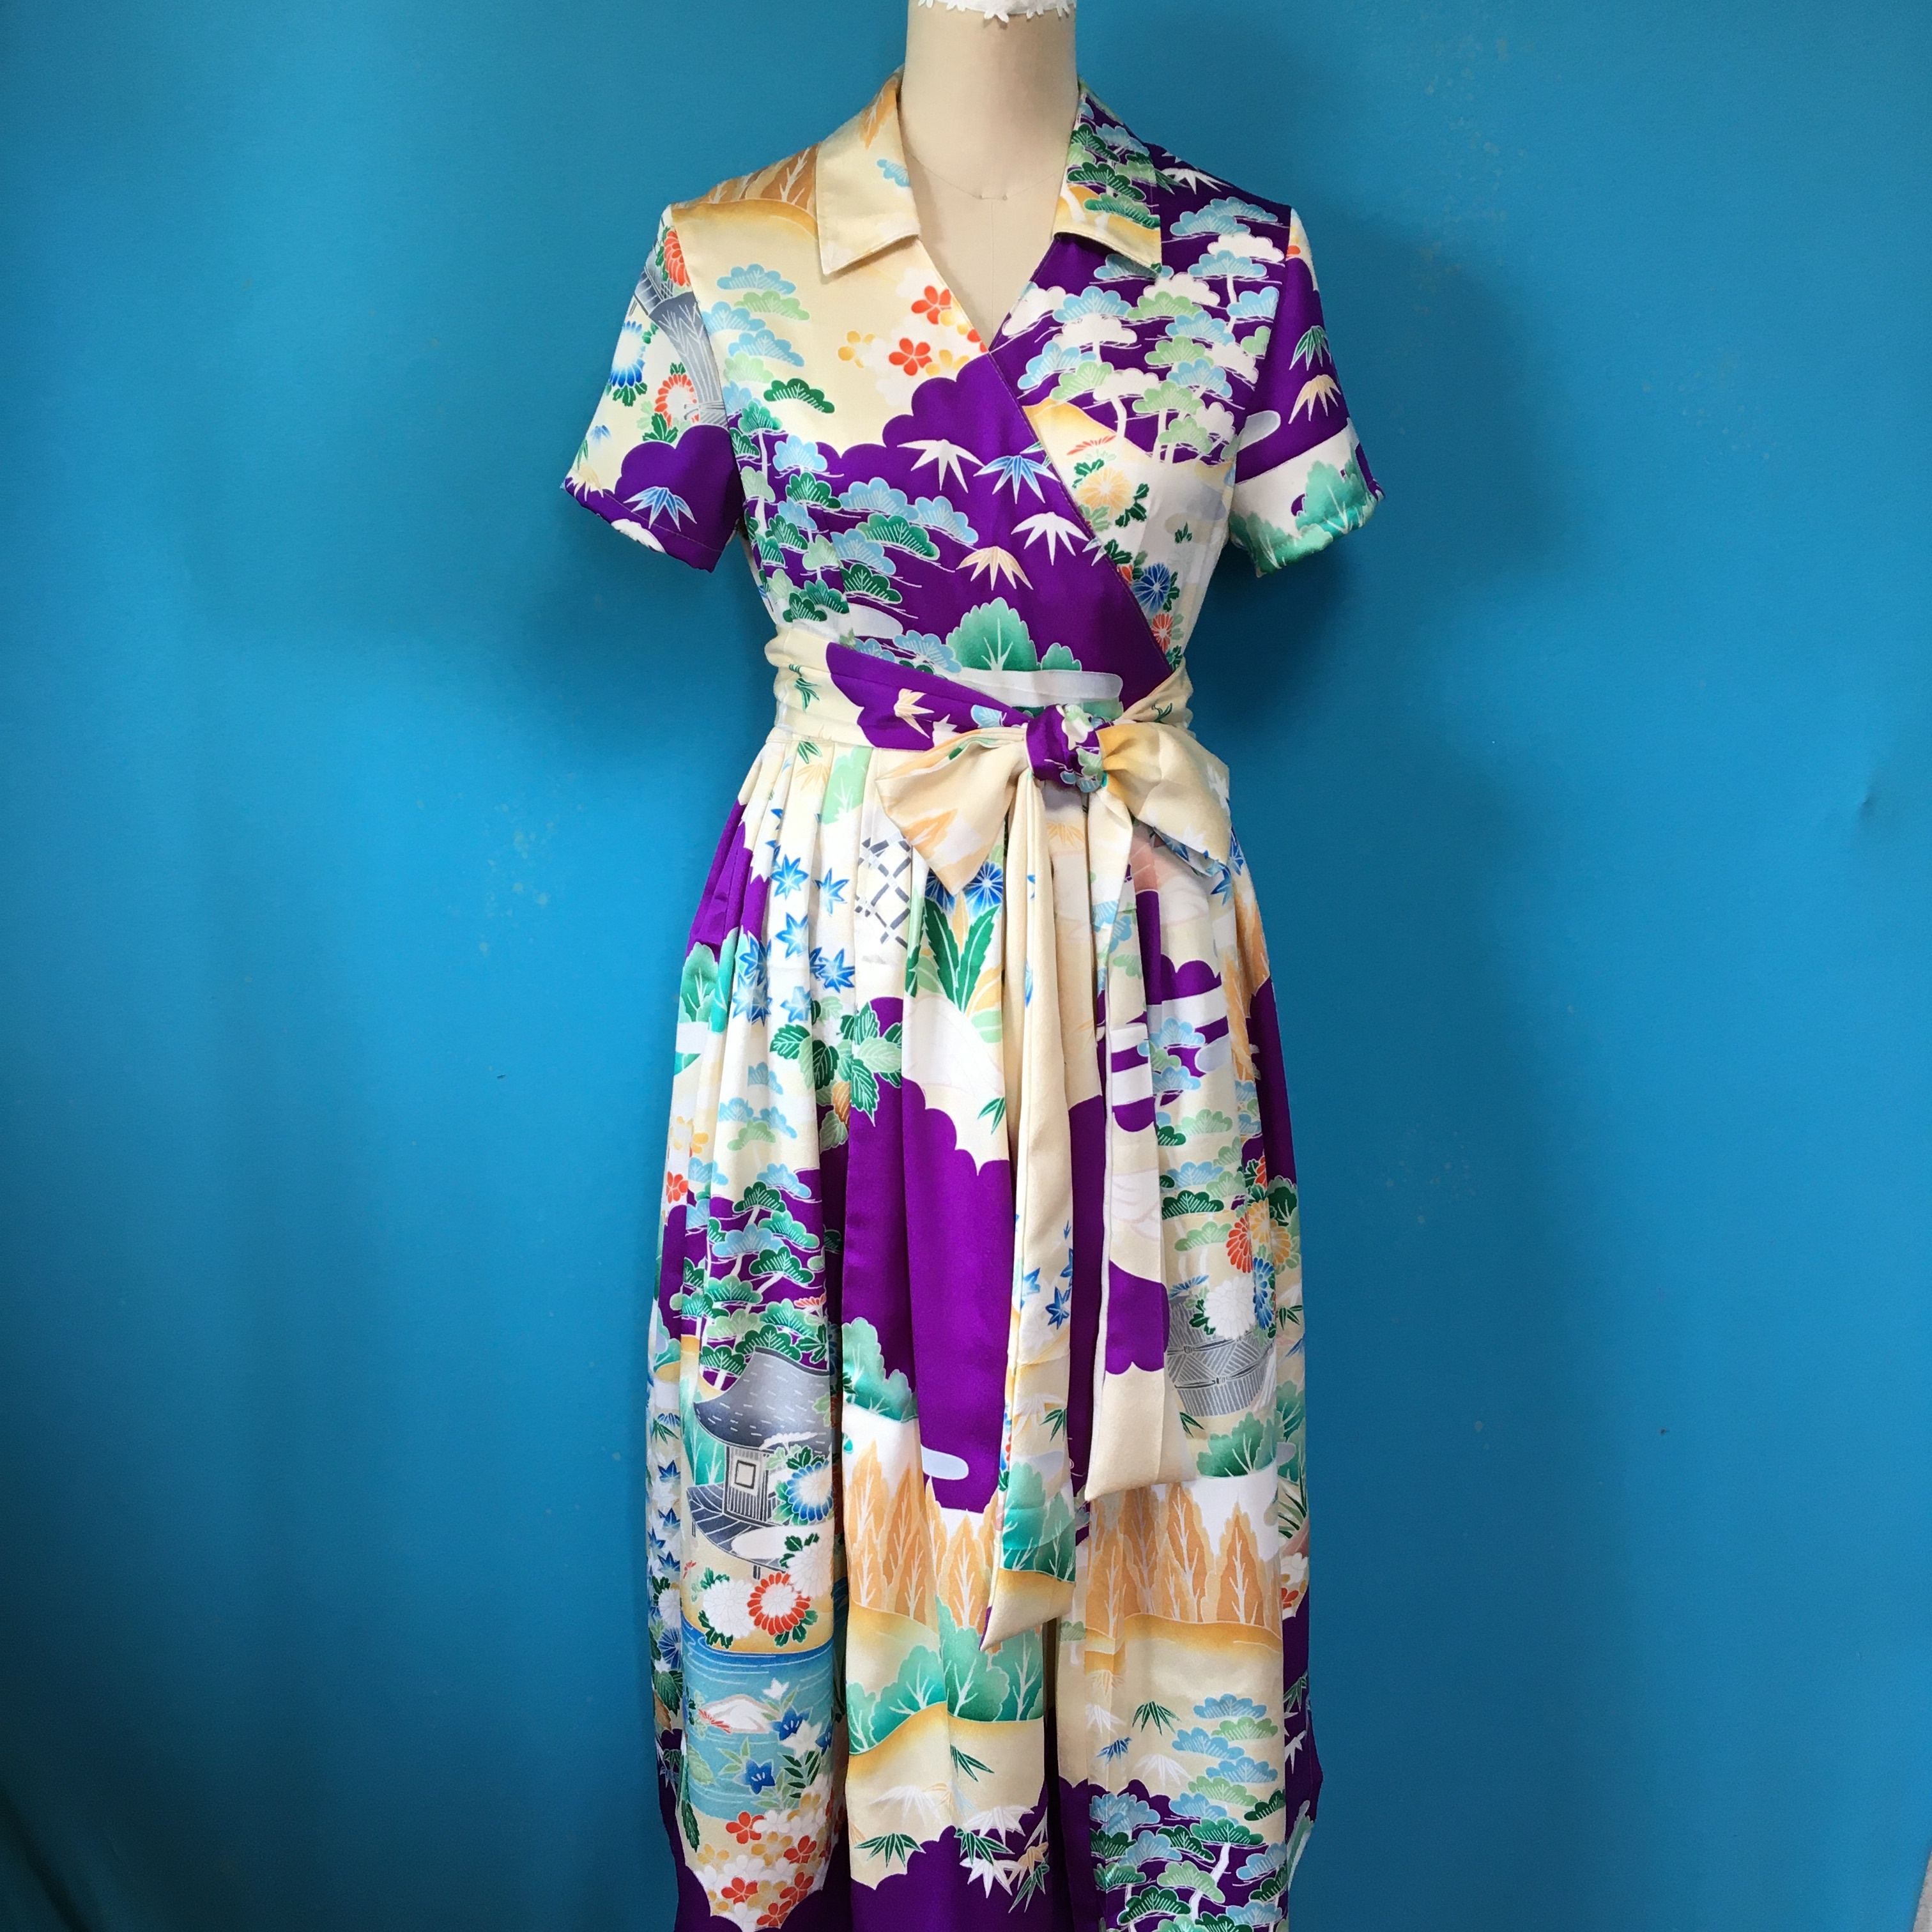 Vintage 着物の振袖 紫 ラップワンピース